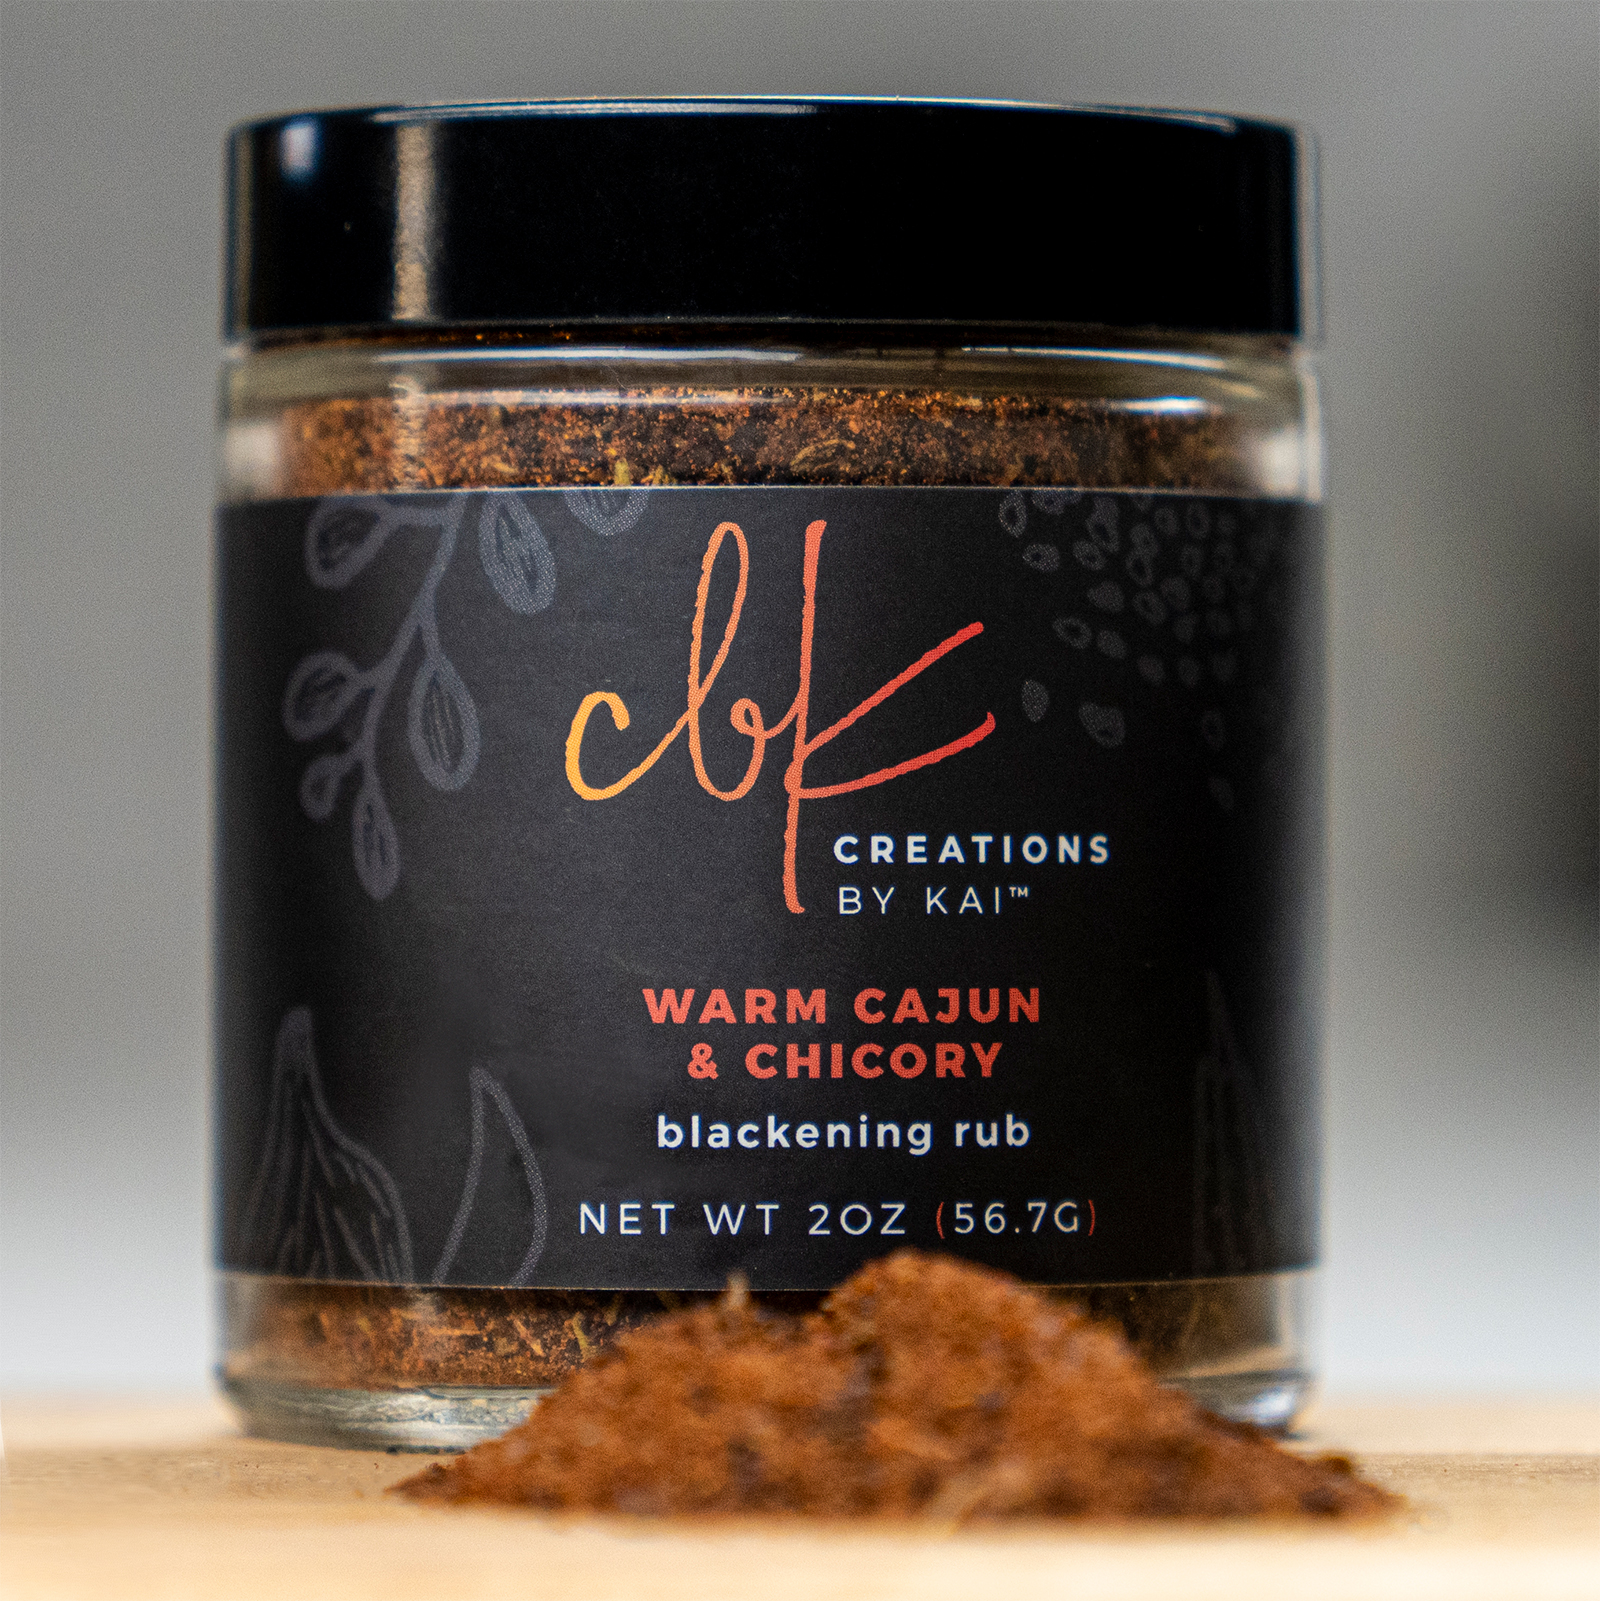 Warm Cajun & Chicory